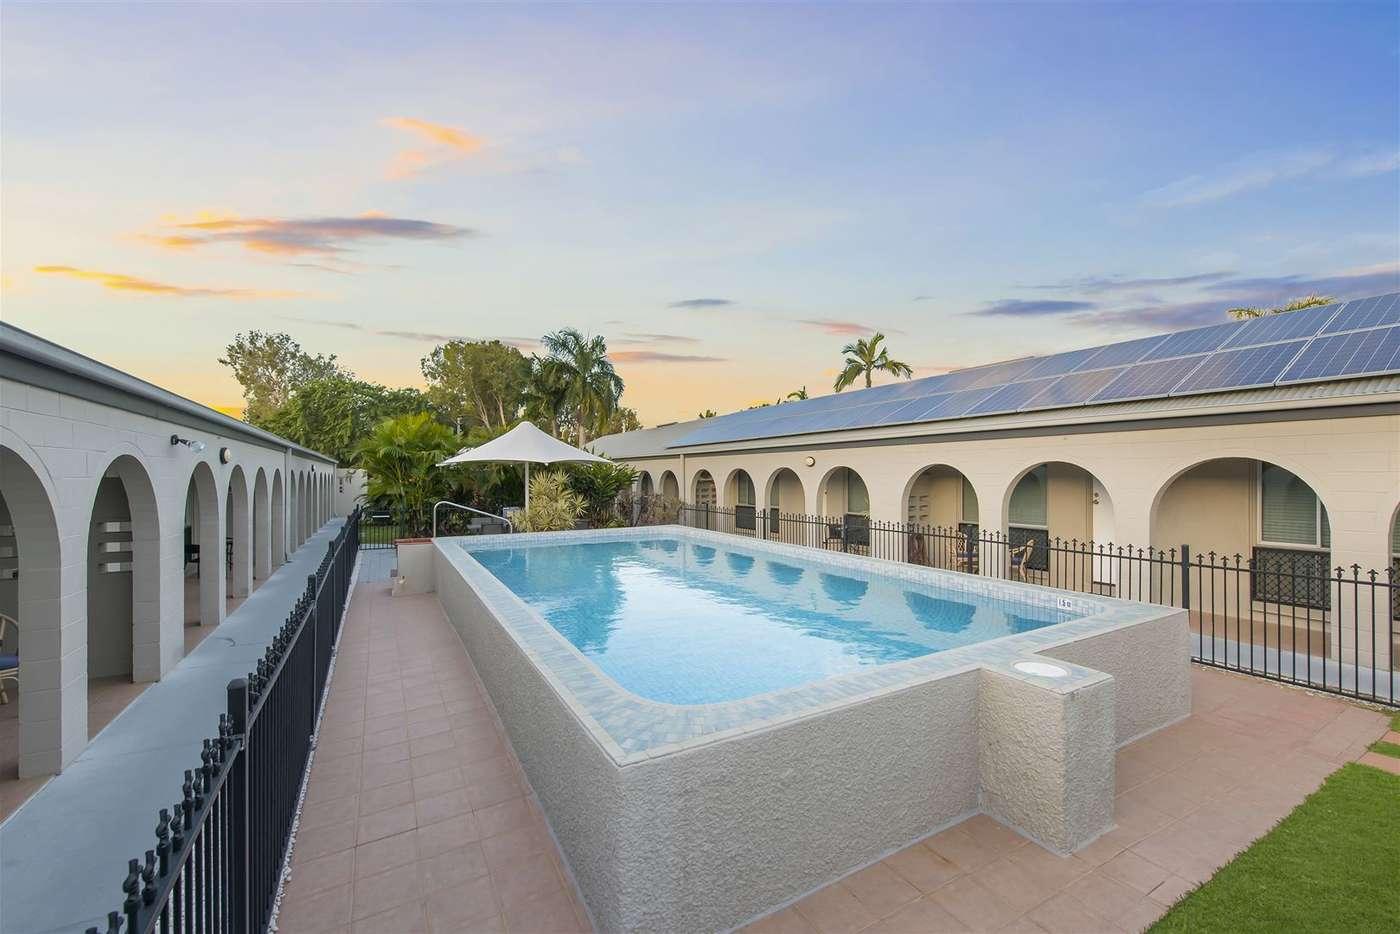 Main view of Homely blockOfUnits listing, 30 Rose Street, North Ward QLD 4810